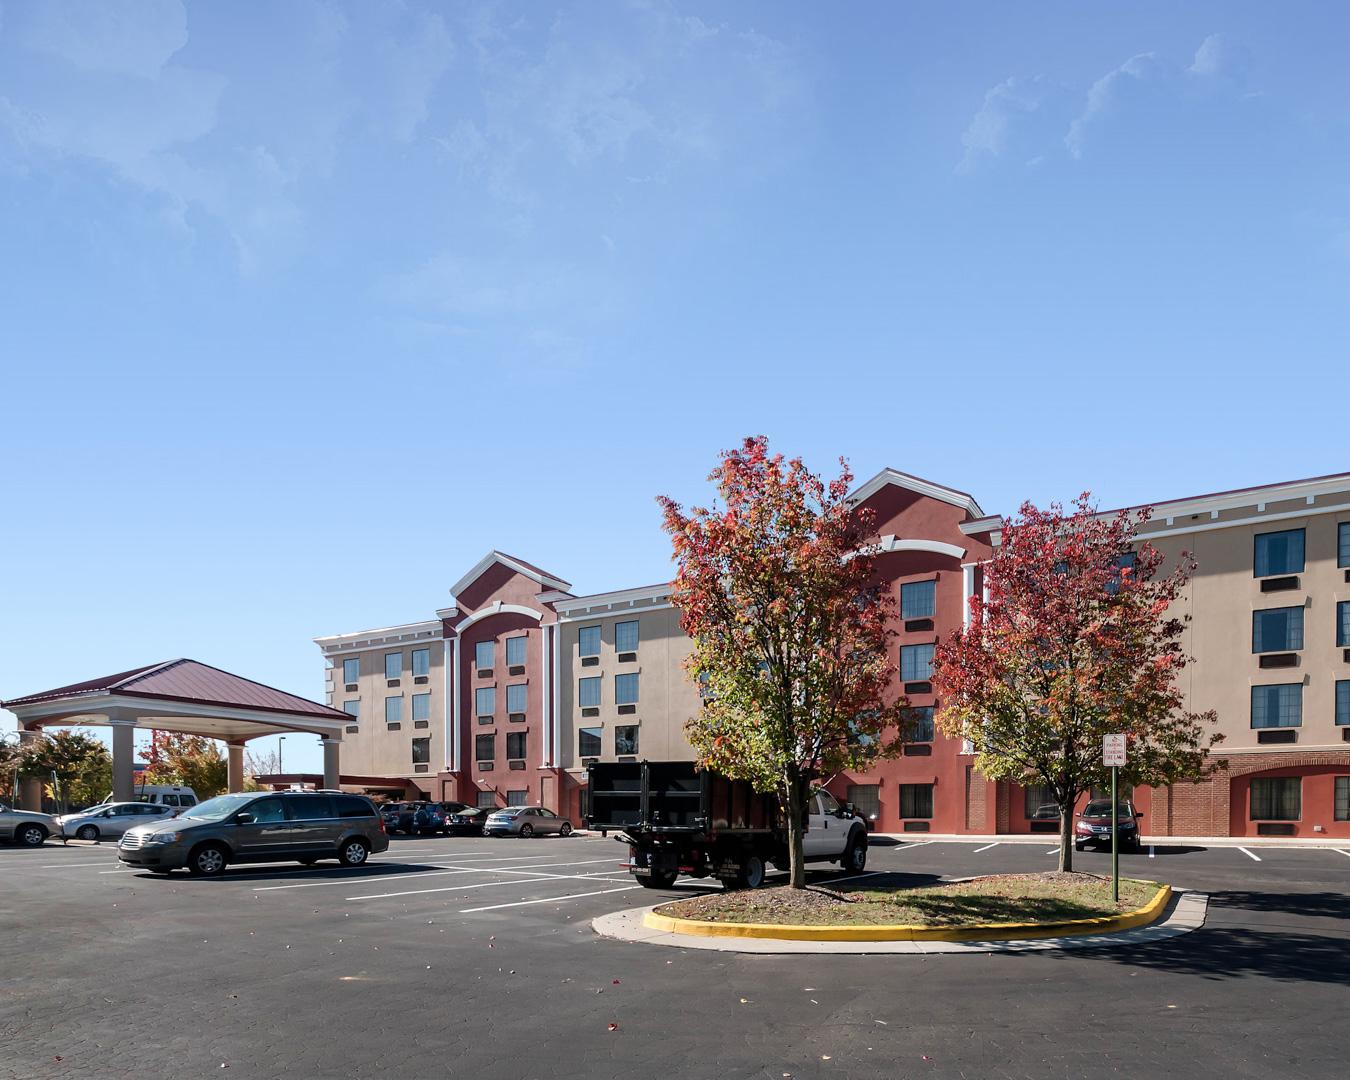 Hampton Inn Dulles Airport South Hotel in Chantilly VA